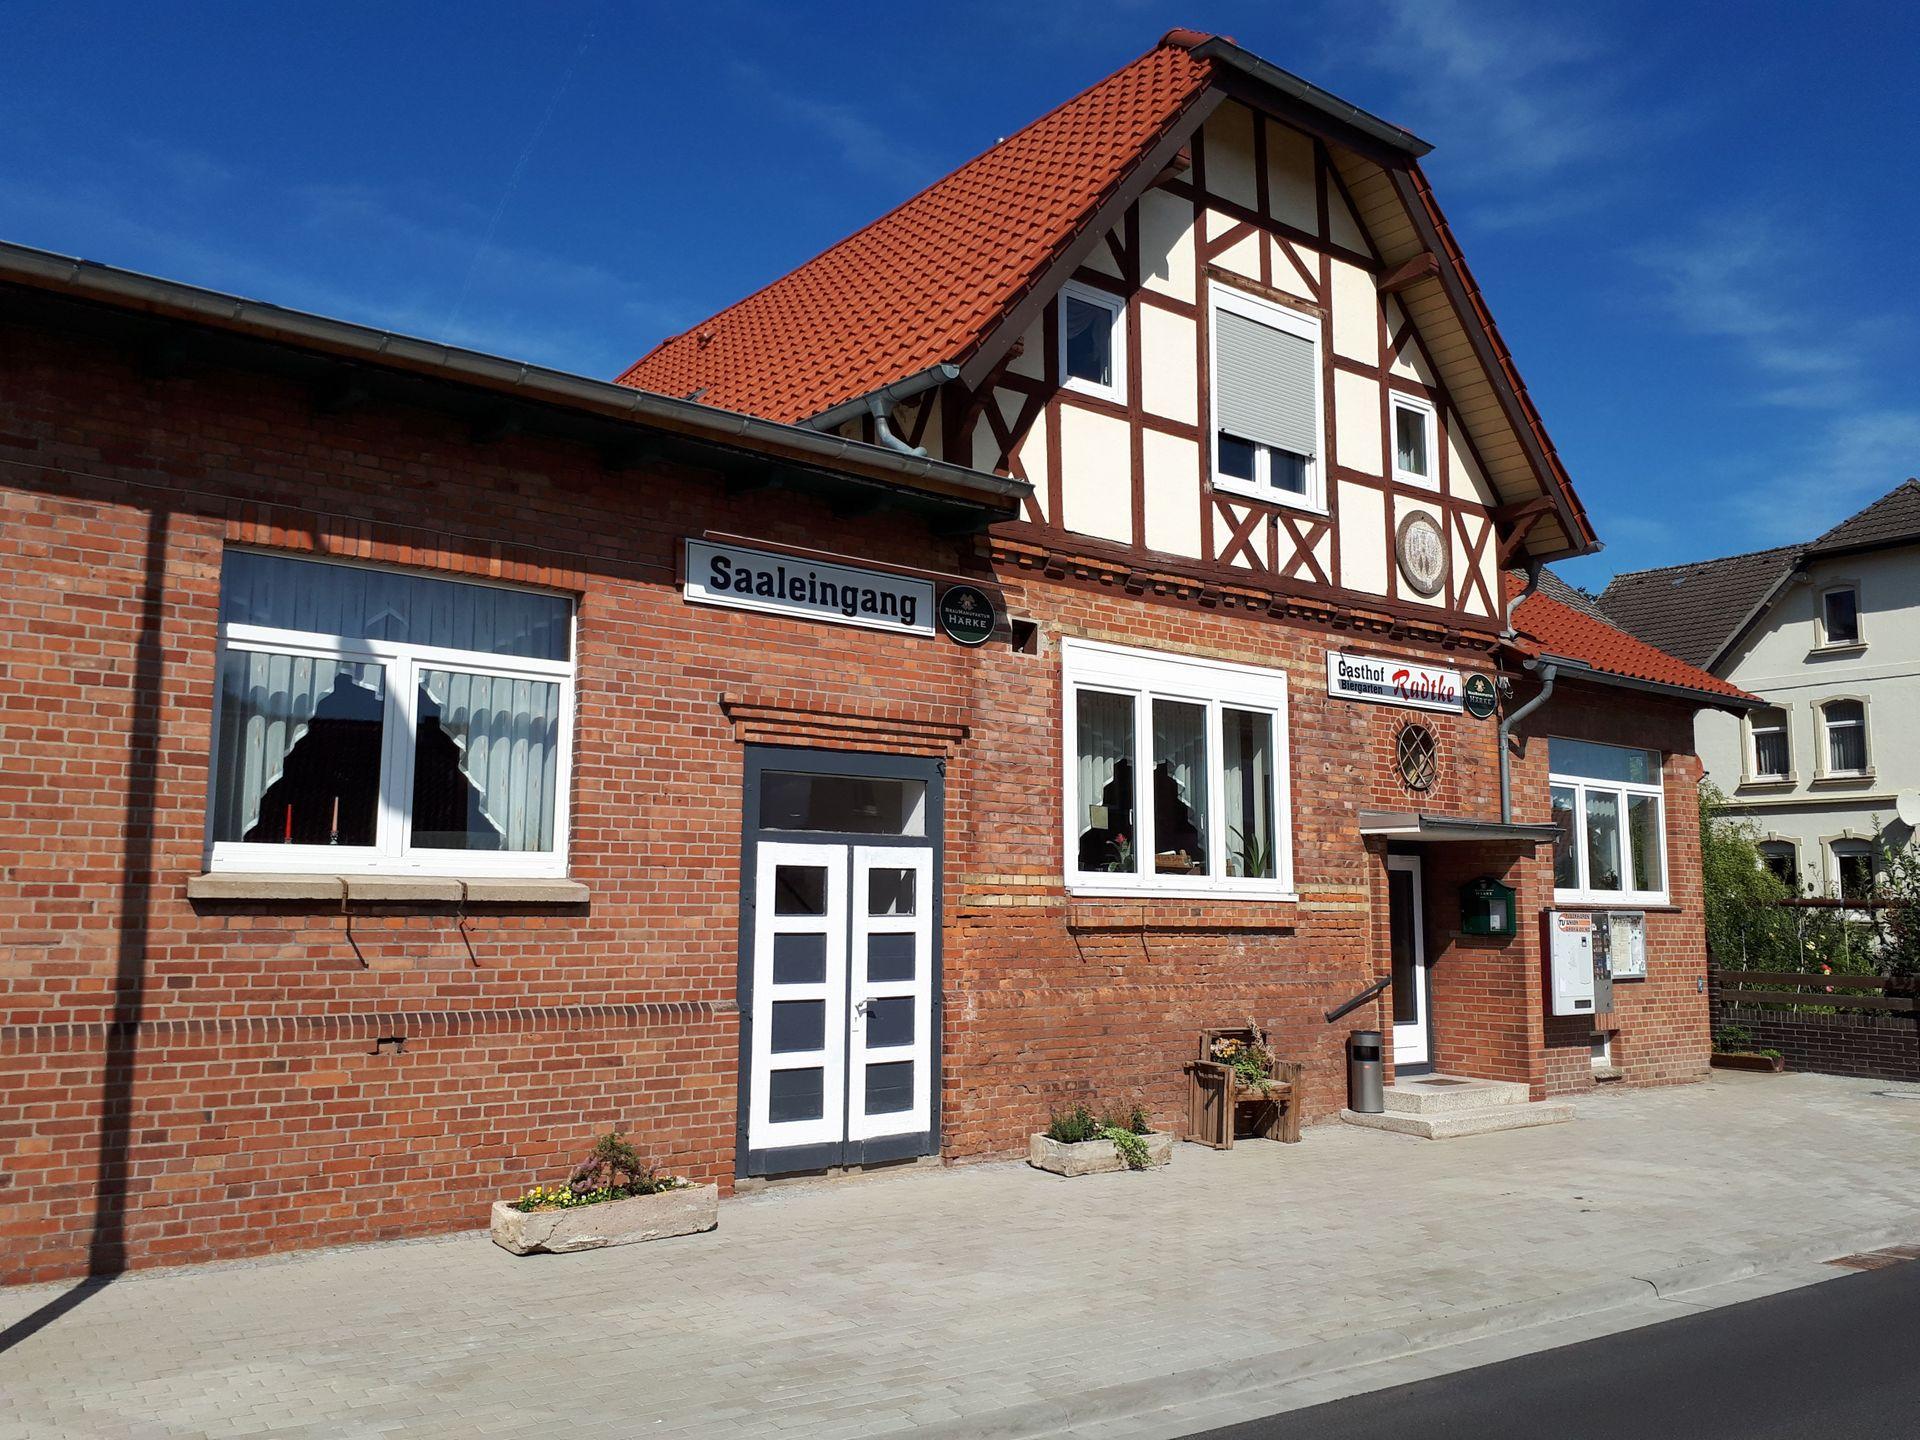 Willkommen! Welcome! Bien venue! | Gasthof Radtke